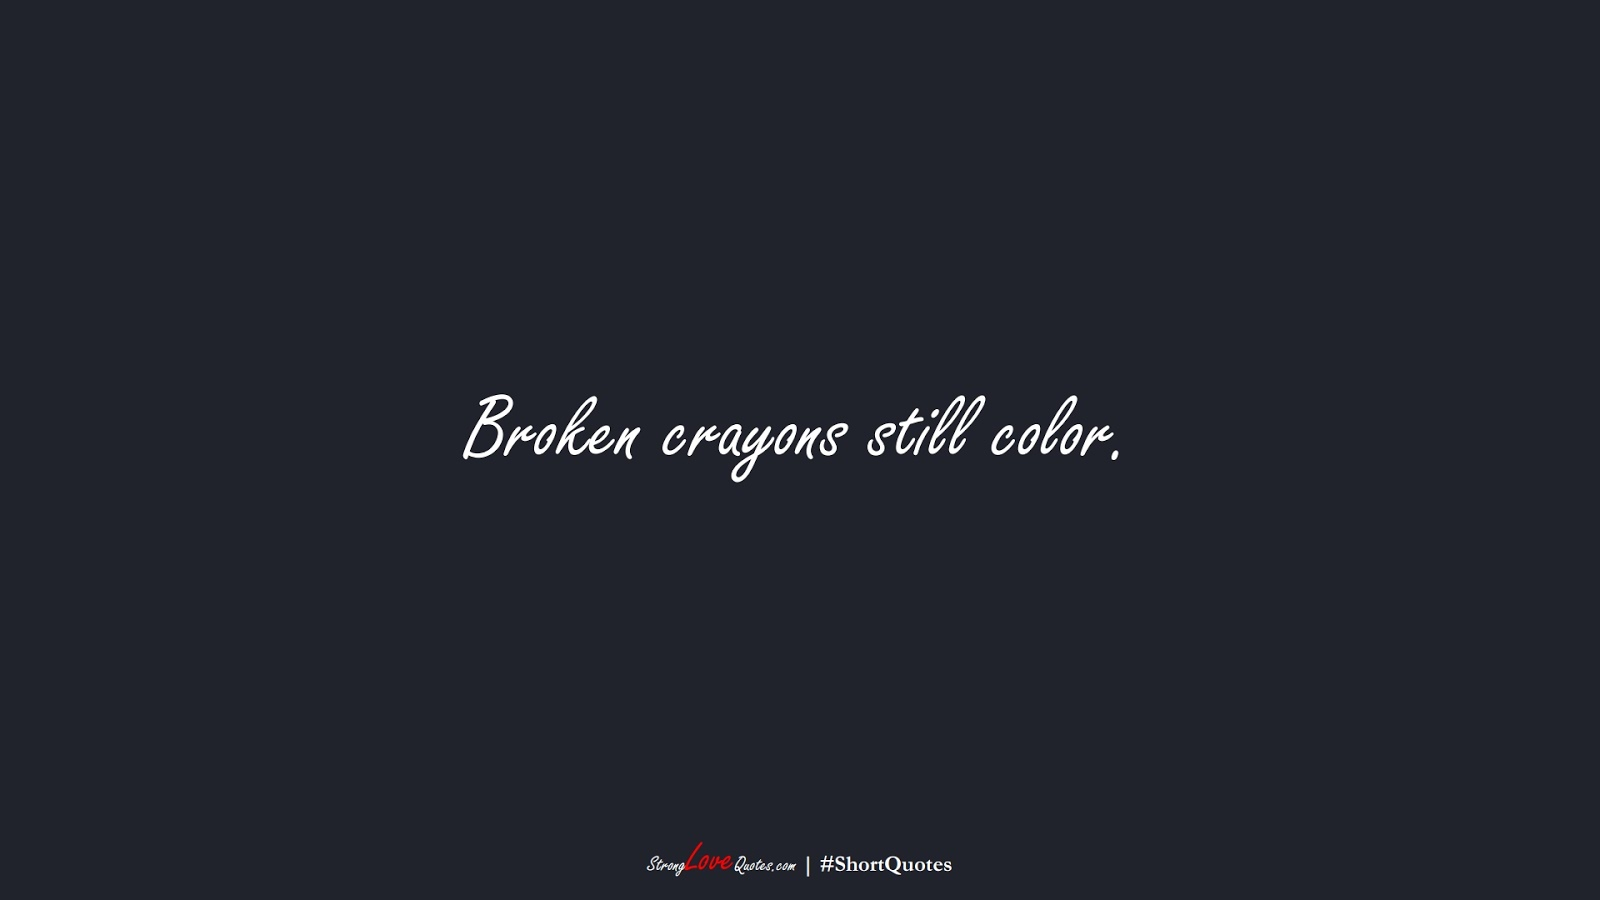 Broken crayons still color.FALSE